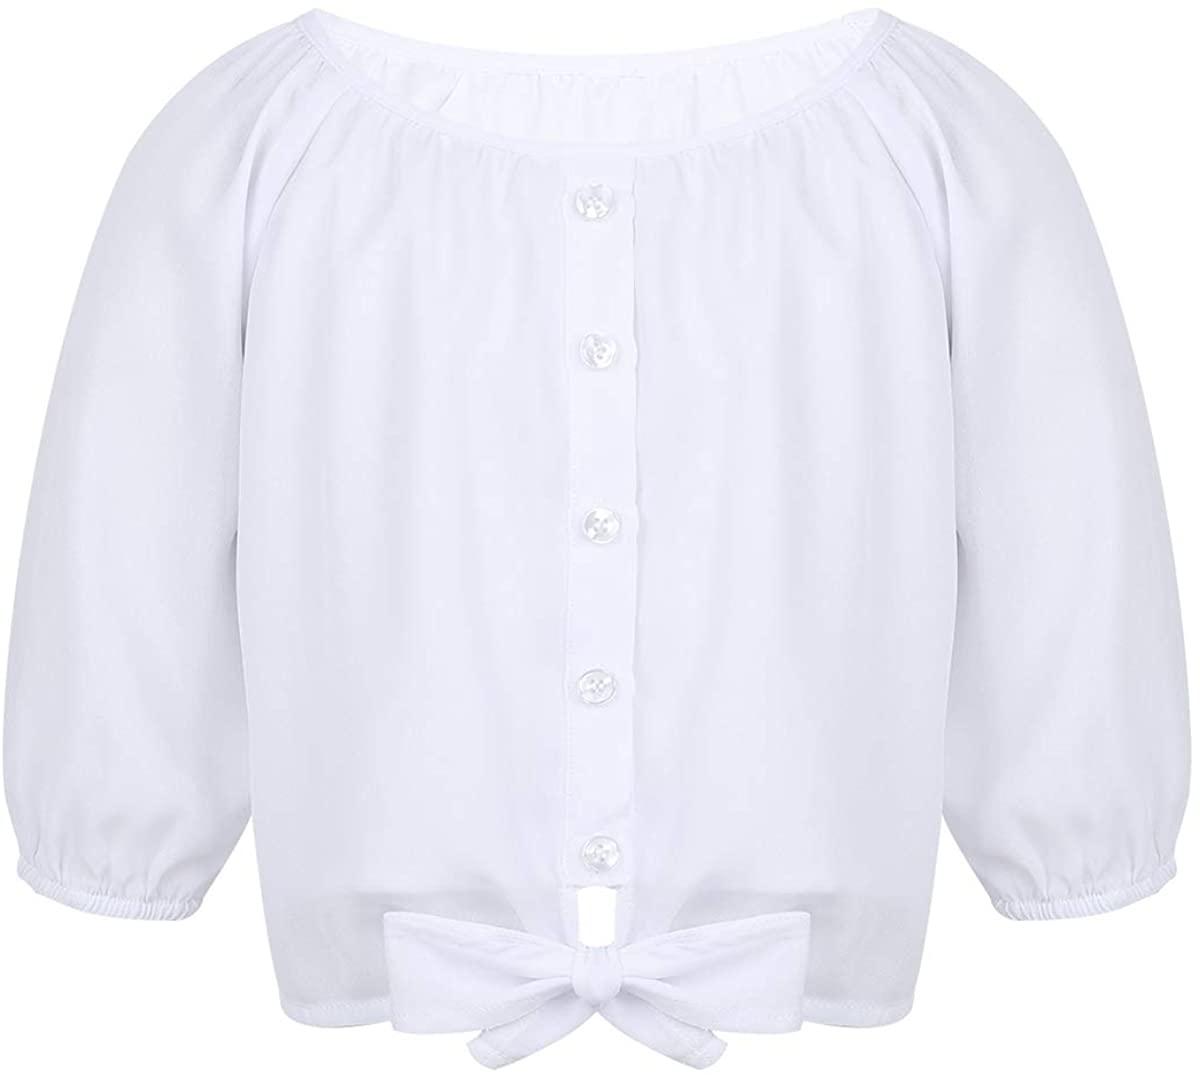 iiniim Kids Girls 3/4 Sleeves Chiffon Fashion Tee Shirt Blouse Top Round Neck Buttons Closure Shirt with Tie-Front